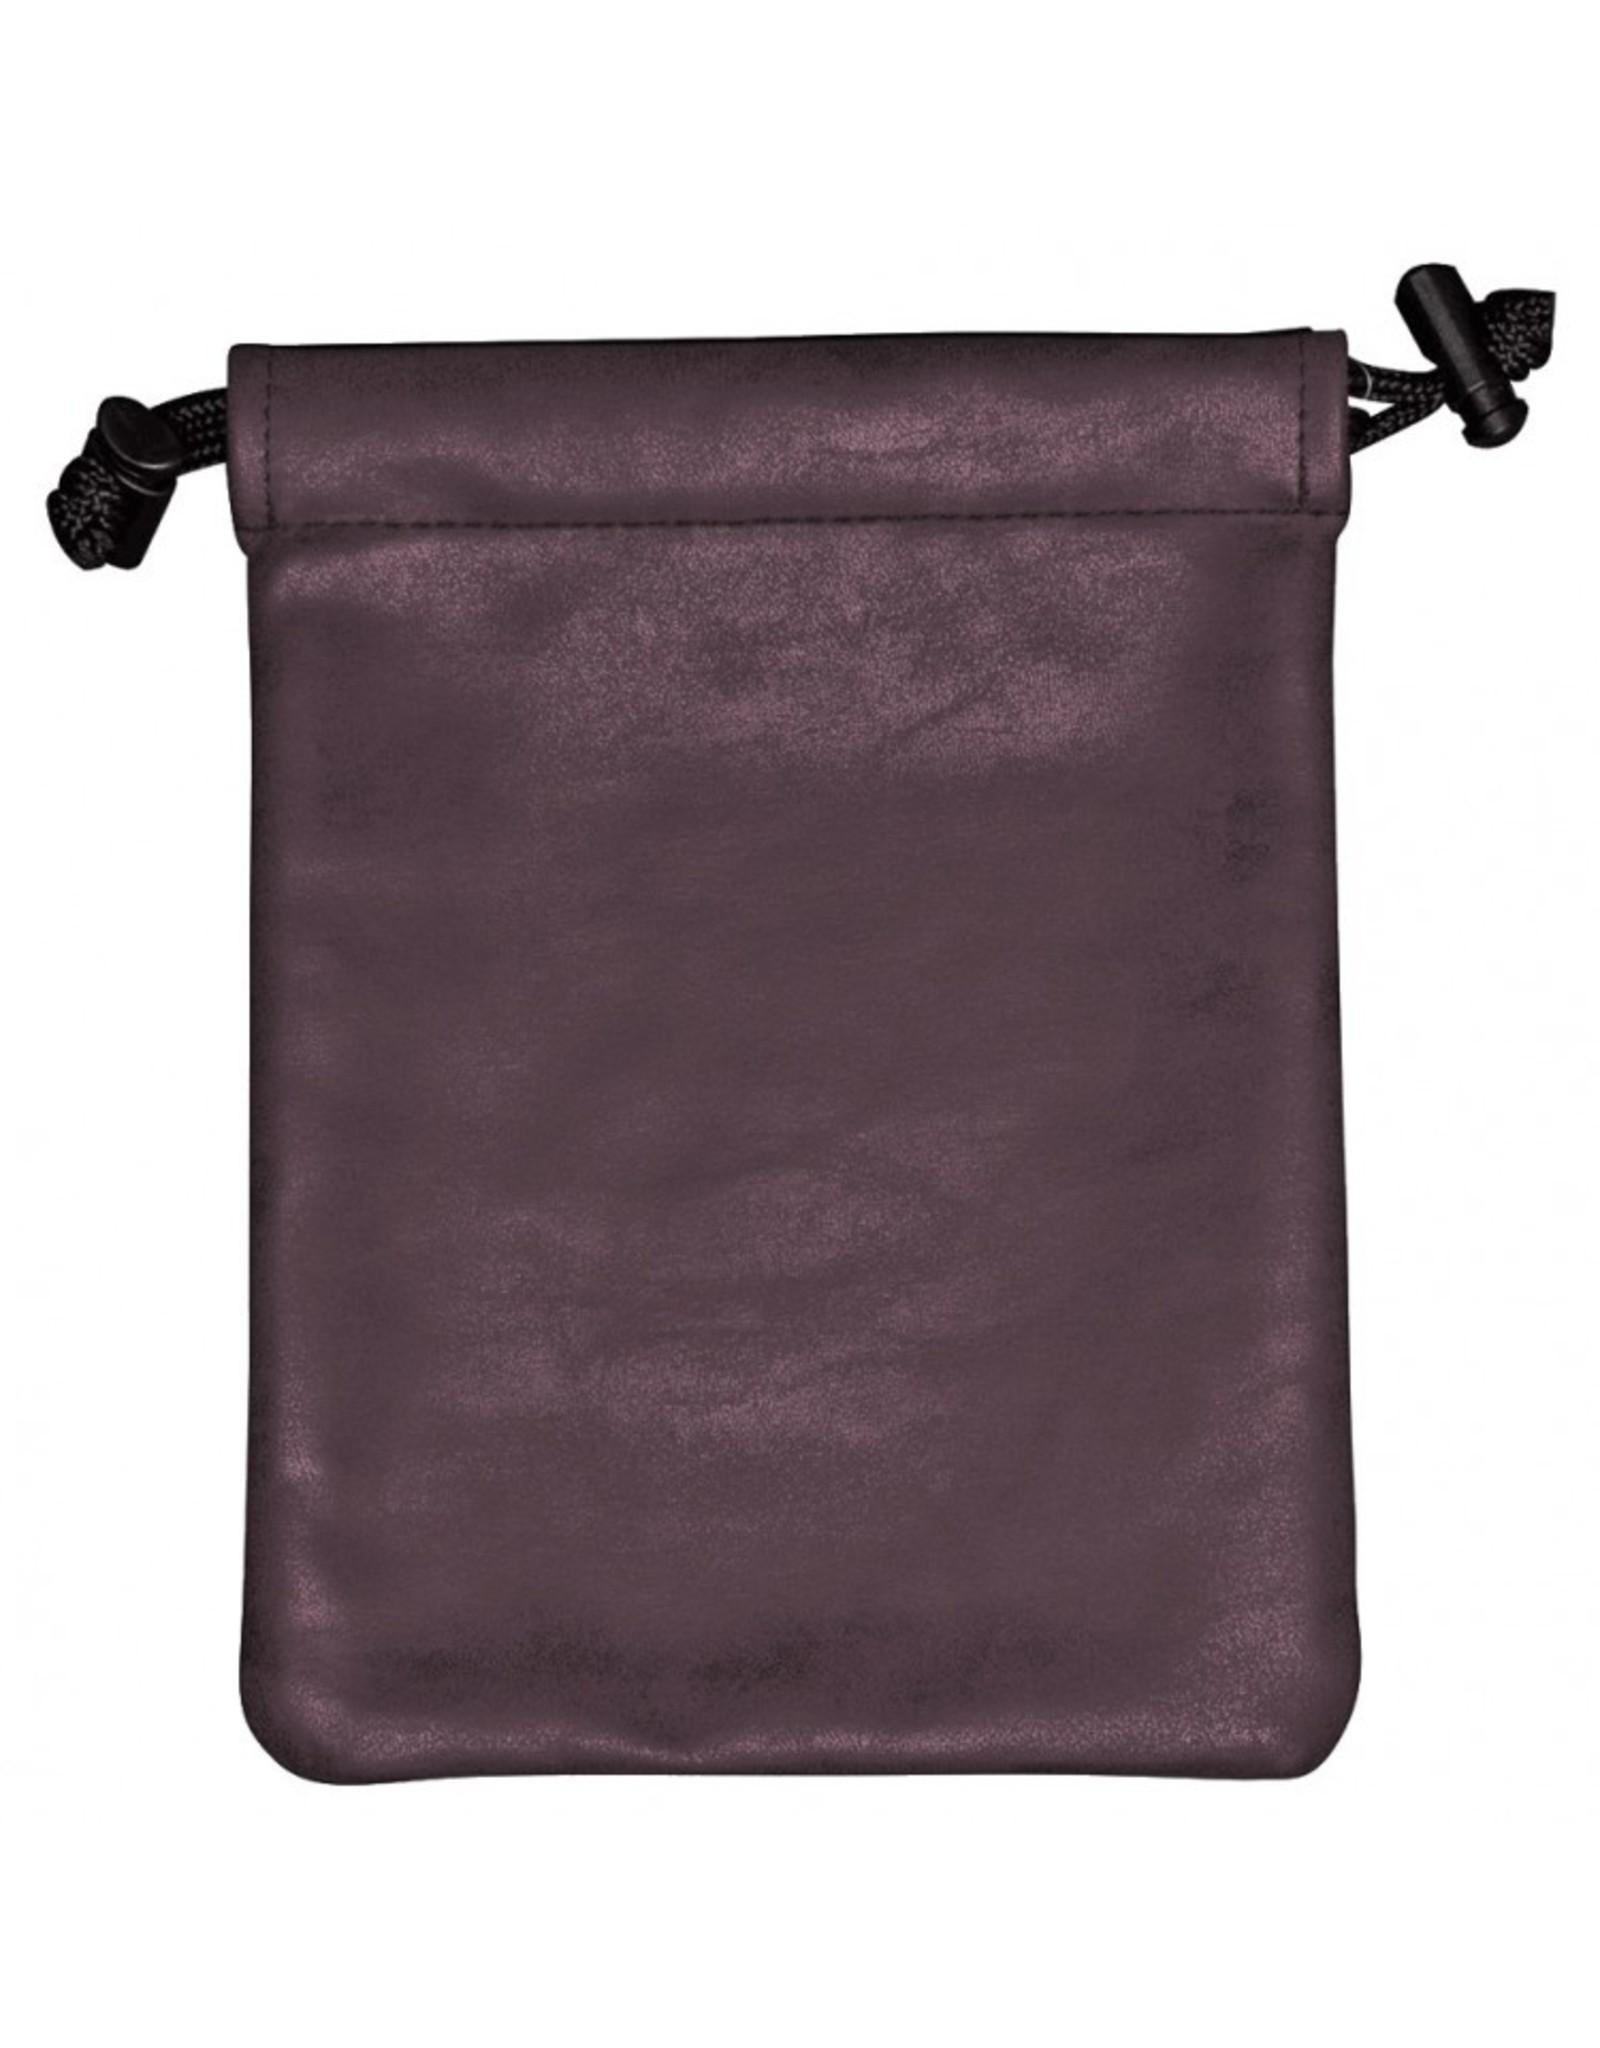 Ultra Pro Dice Bag: Suede: Treasure Nest: Amethyst